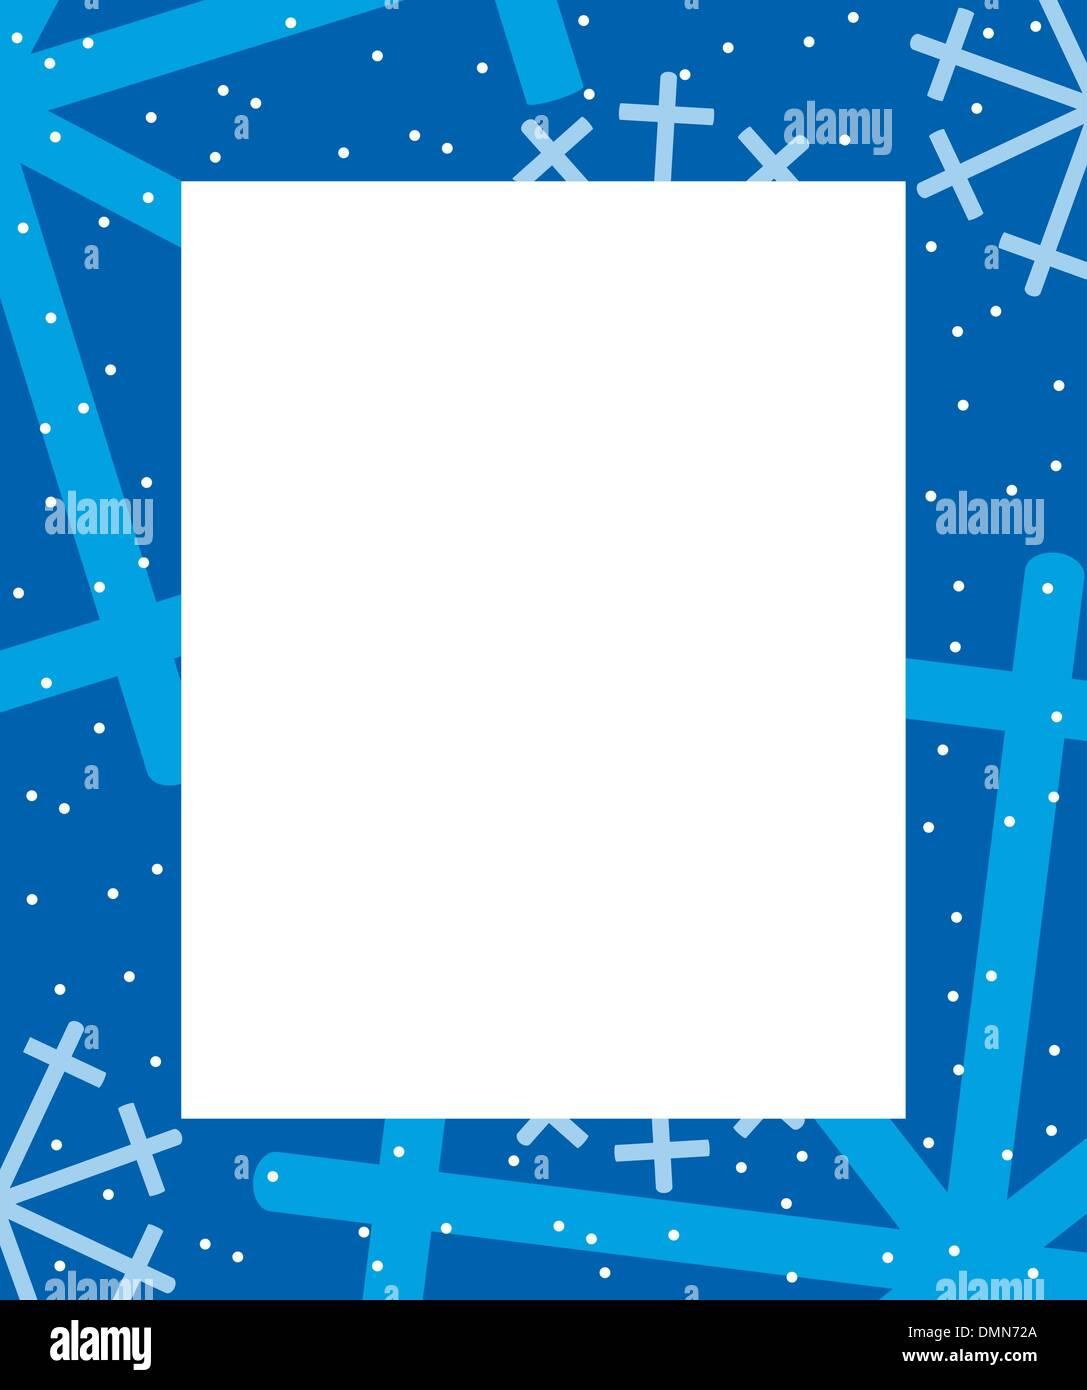 5e376456d81b Frame winter. - Image ID  DMN72A. Frame winter Stock Vector